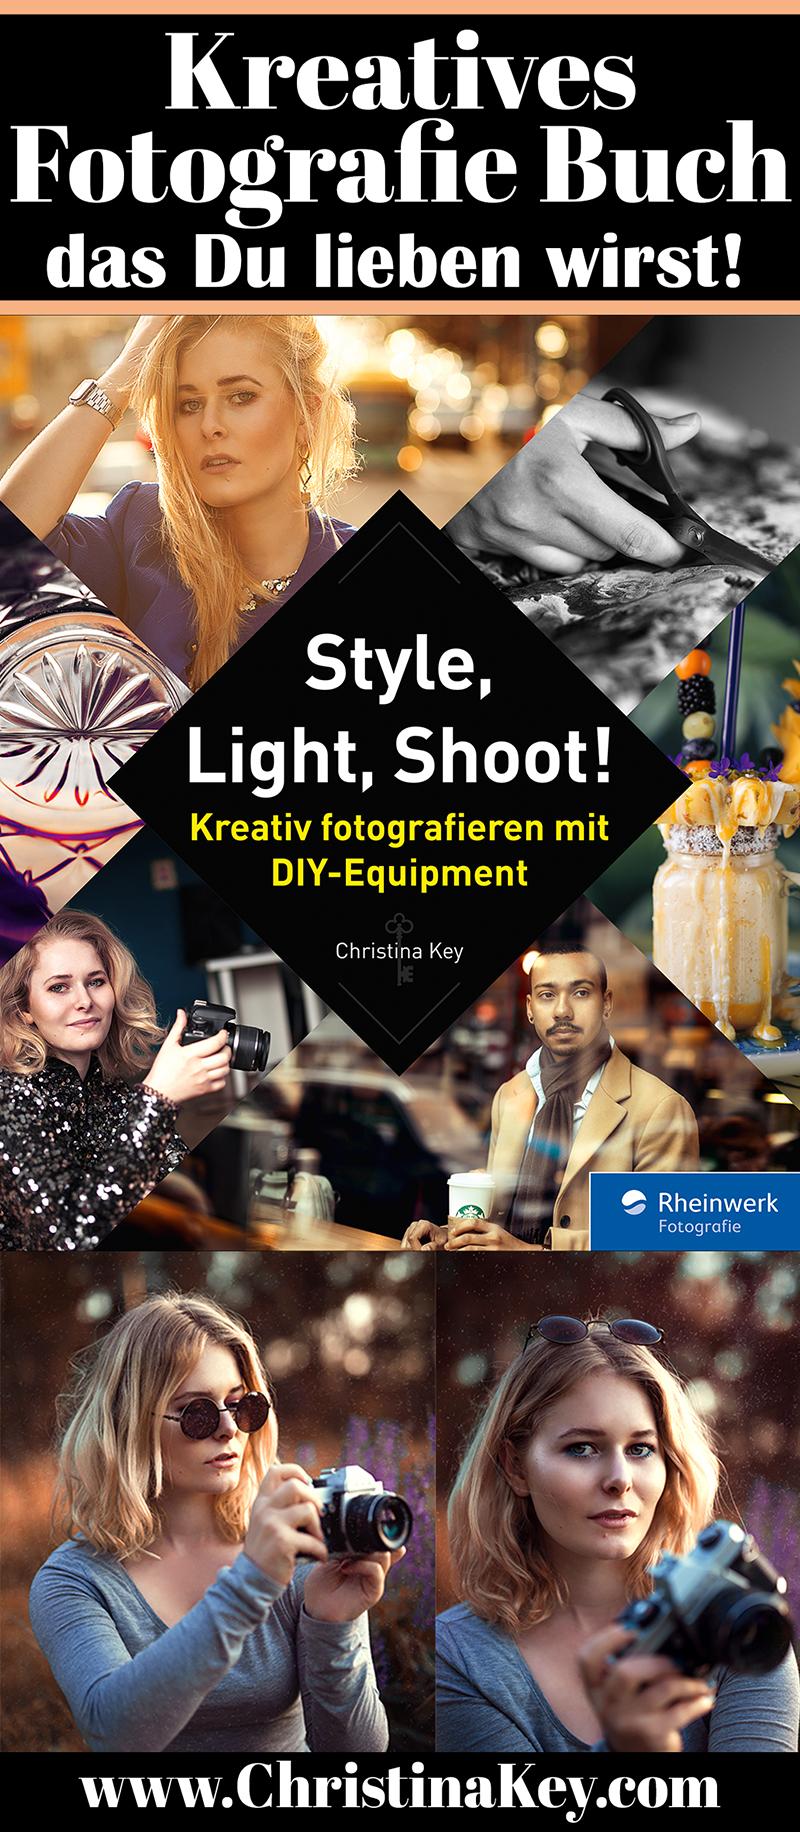 Style Light Shoot Fotografie Buch